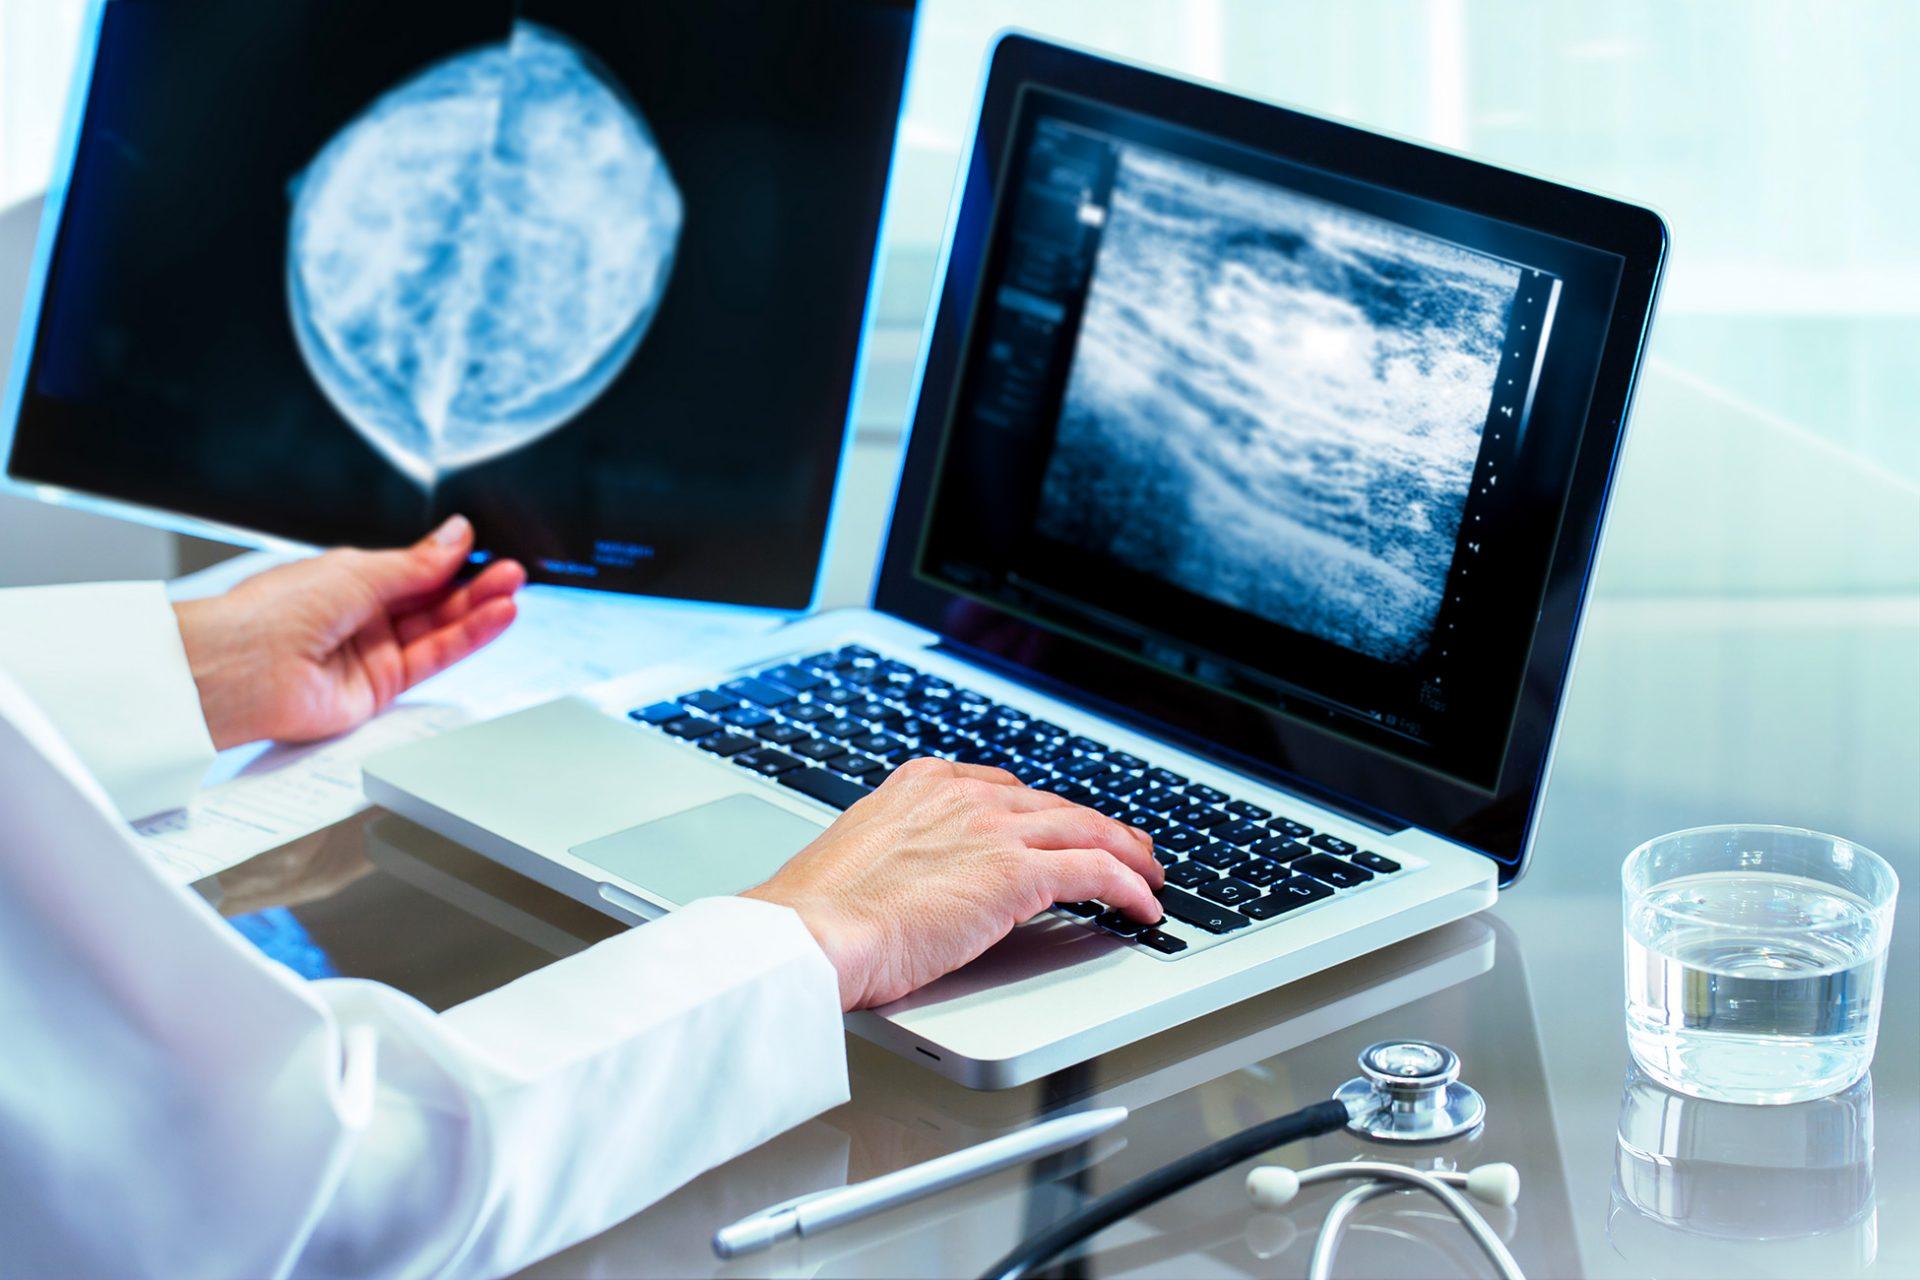 esami ginecologici milano, esami di ginecologia a milano, visite ginecologia milano, visite ginecologia a milano